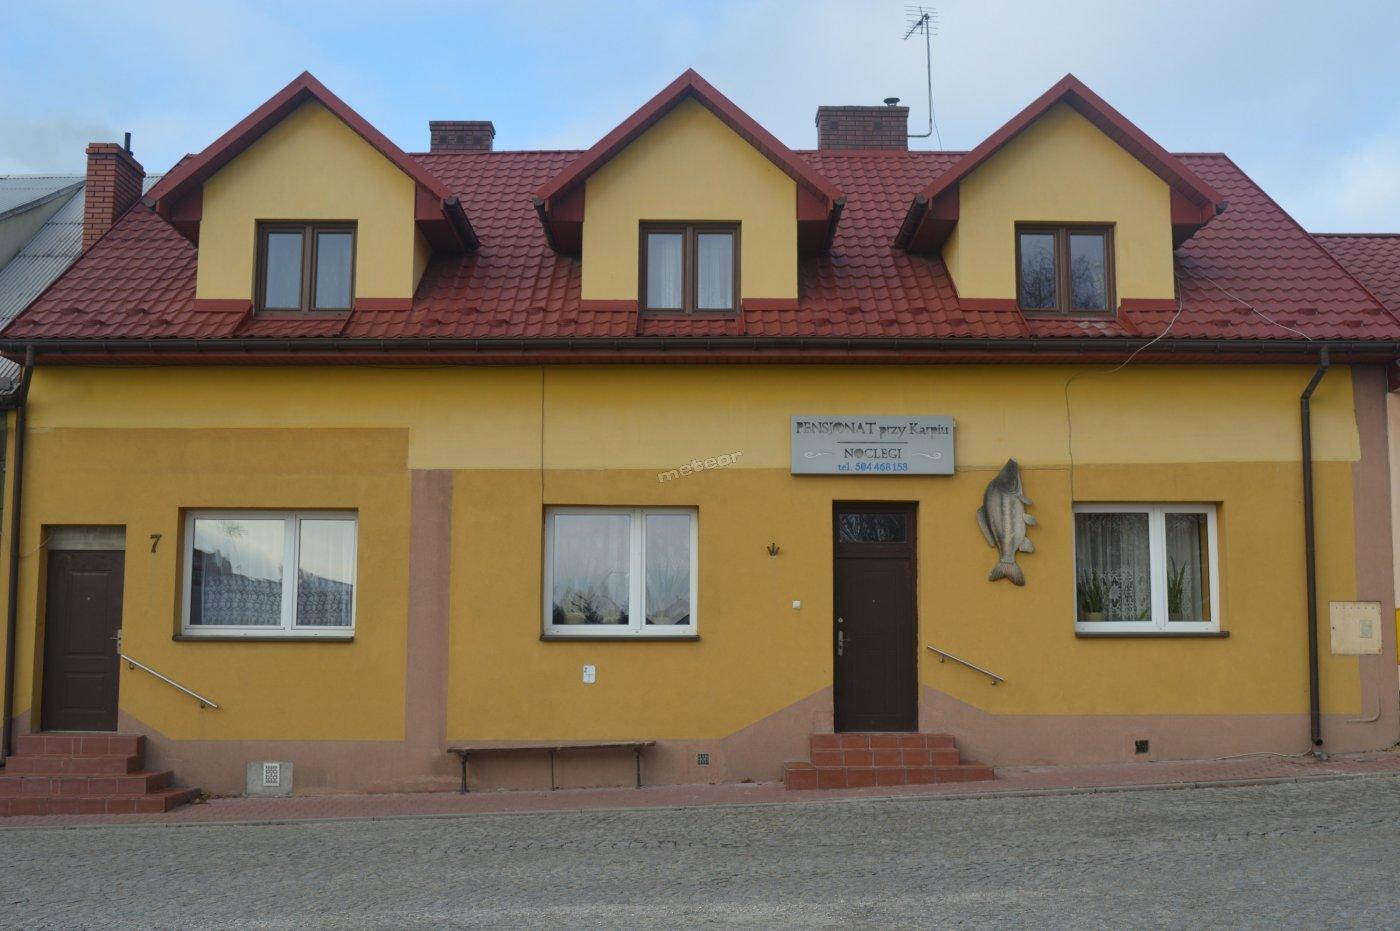 Pensjonat Przy Karpiu